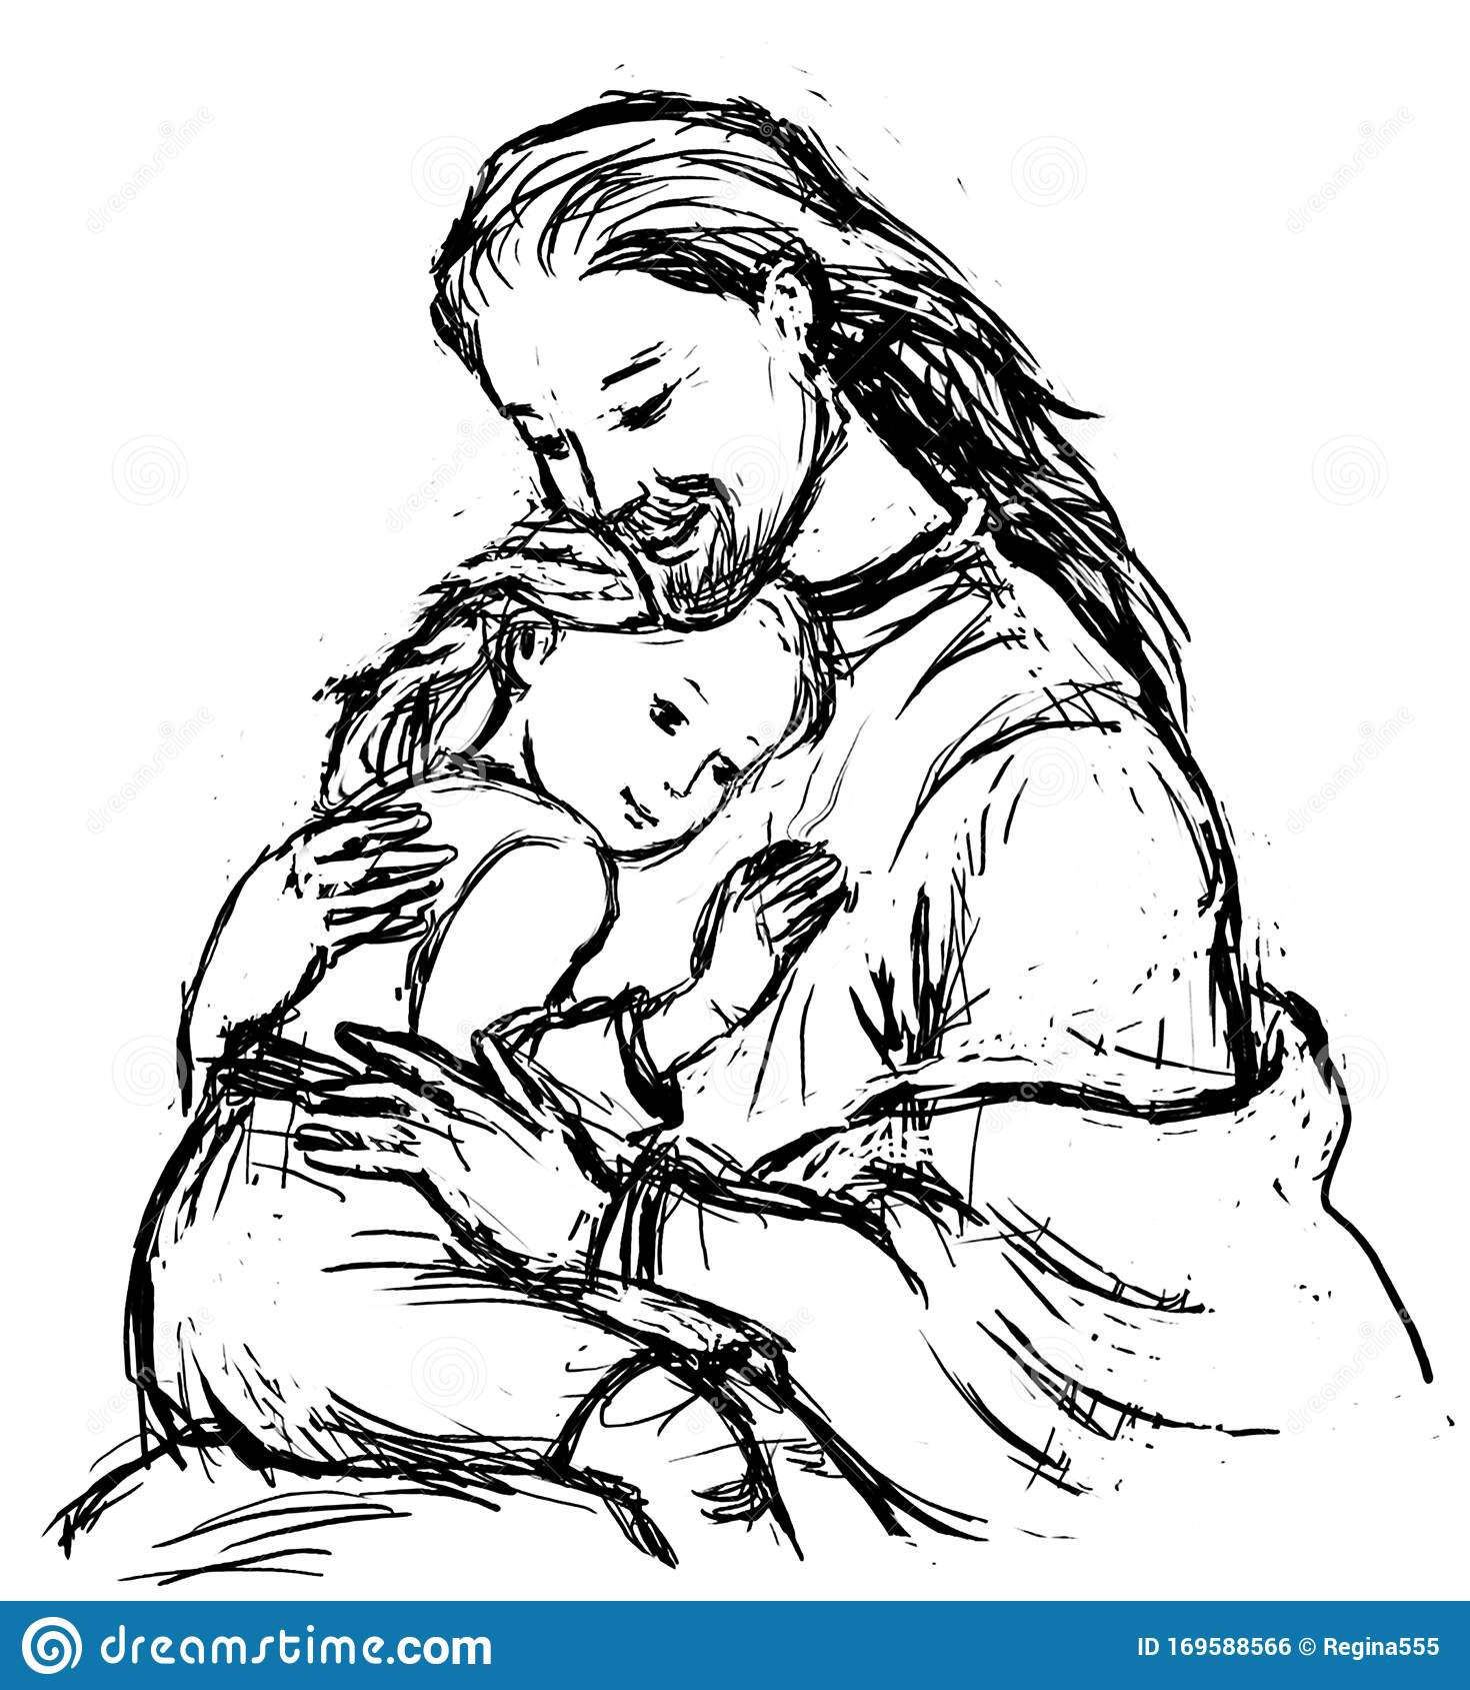 Jesus Little Girl Drawing Stock Illustrations – 87 Jesus Little Girl Drawing  Stock Illustrations, Vectors & Clipart - Dreamstime